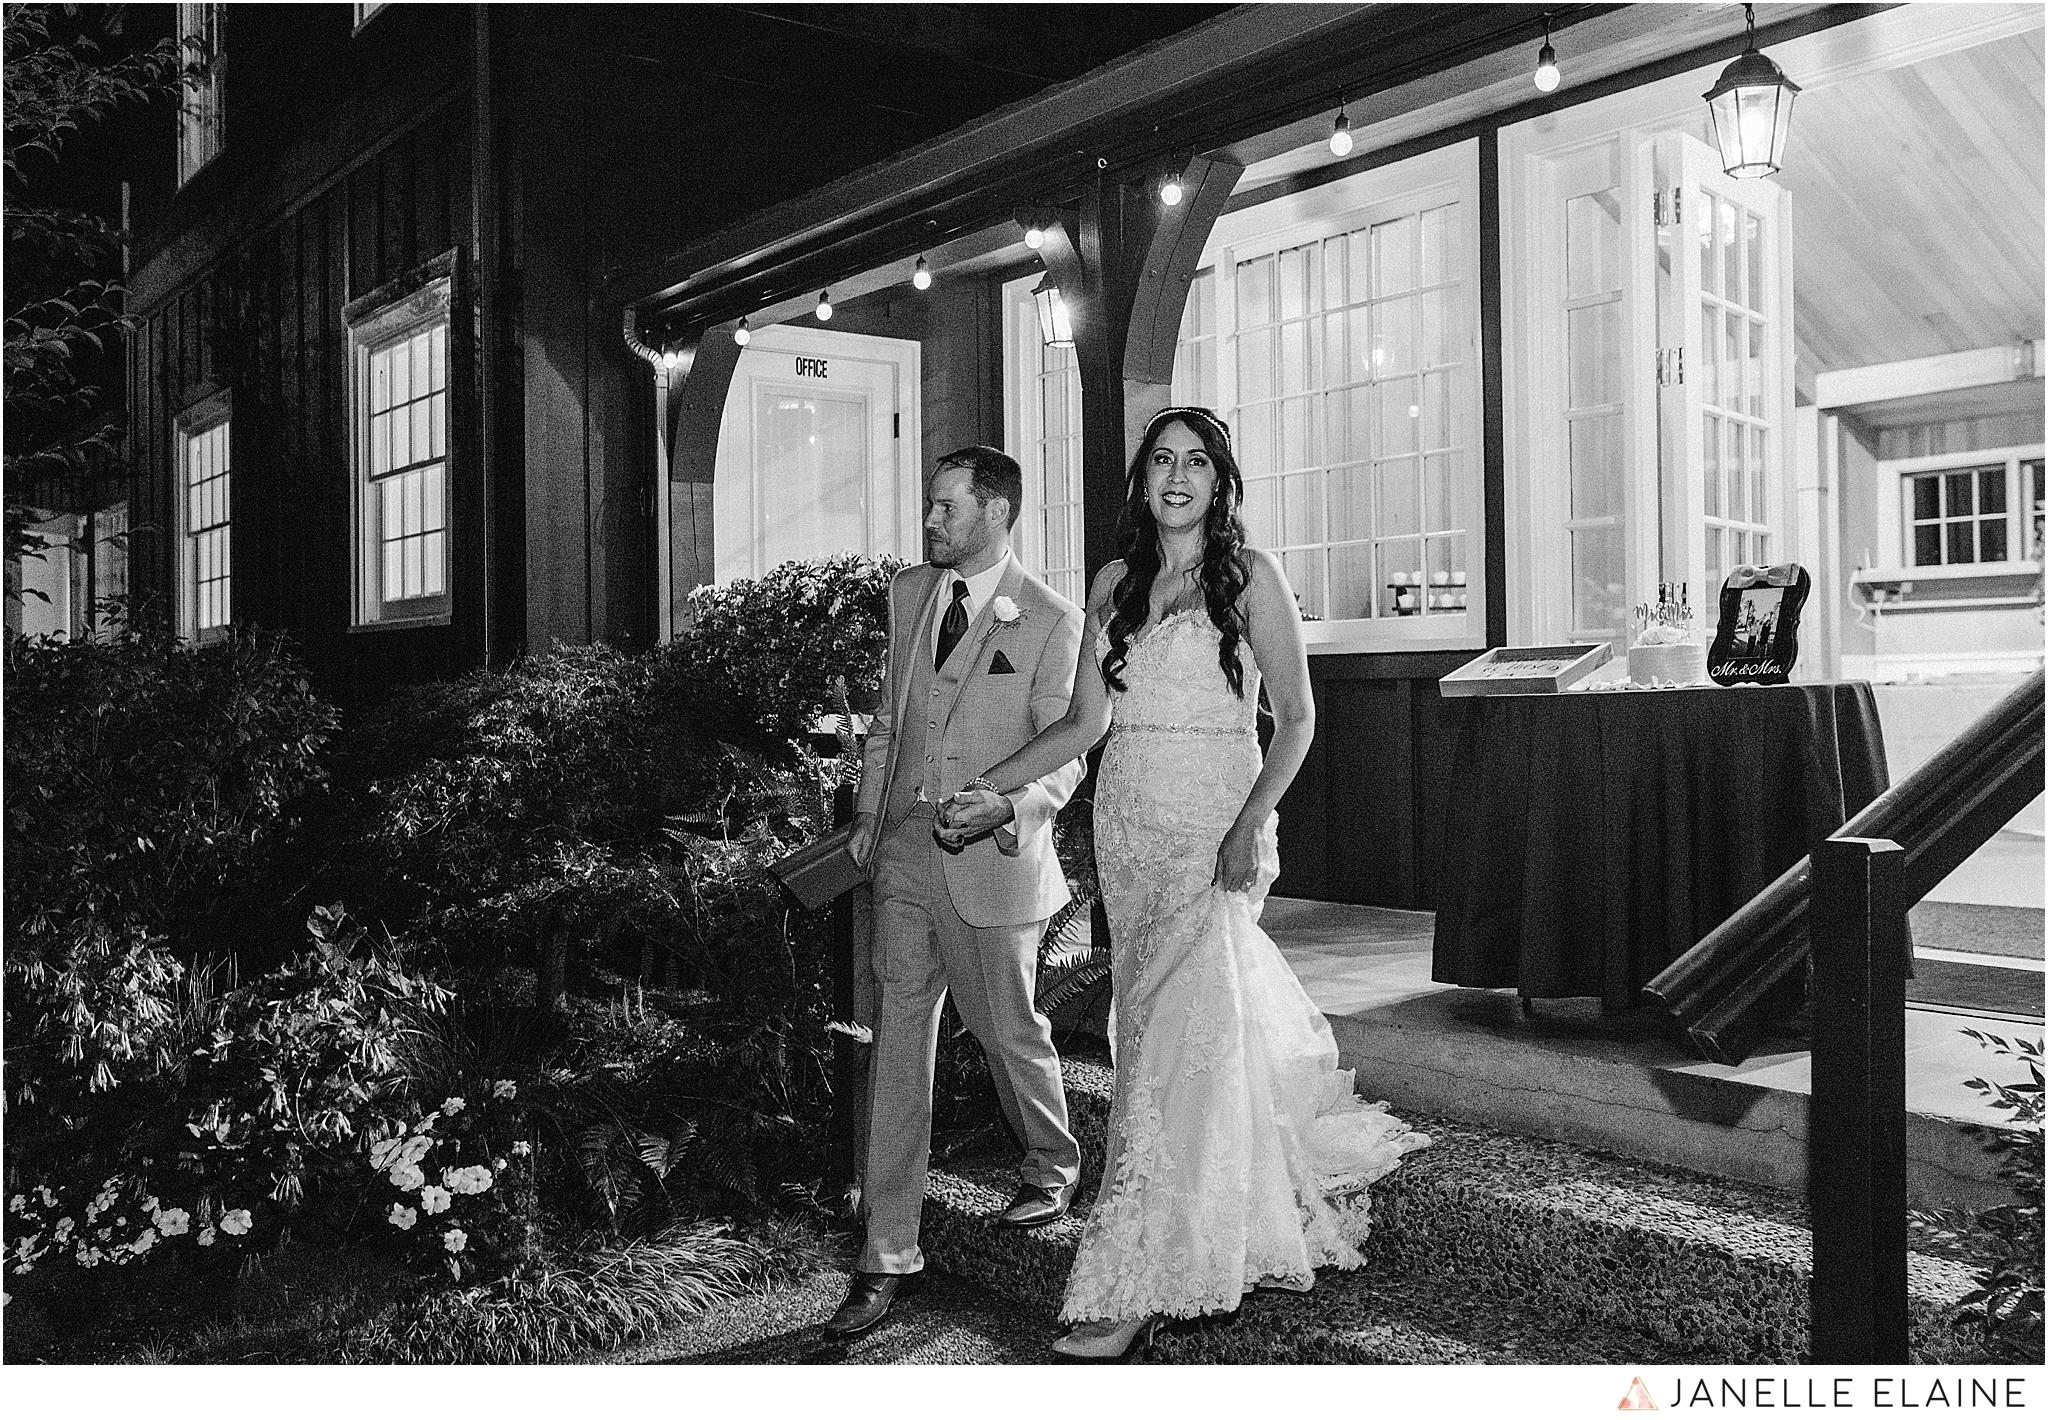 janelle elaine photography-professional wedding photographer-seattle-bellevue-robinswood house-274.jpg